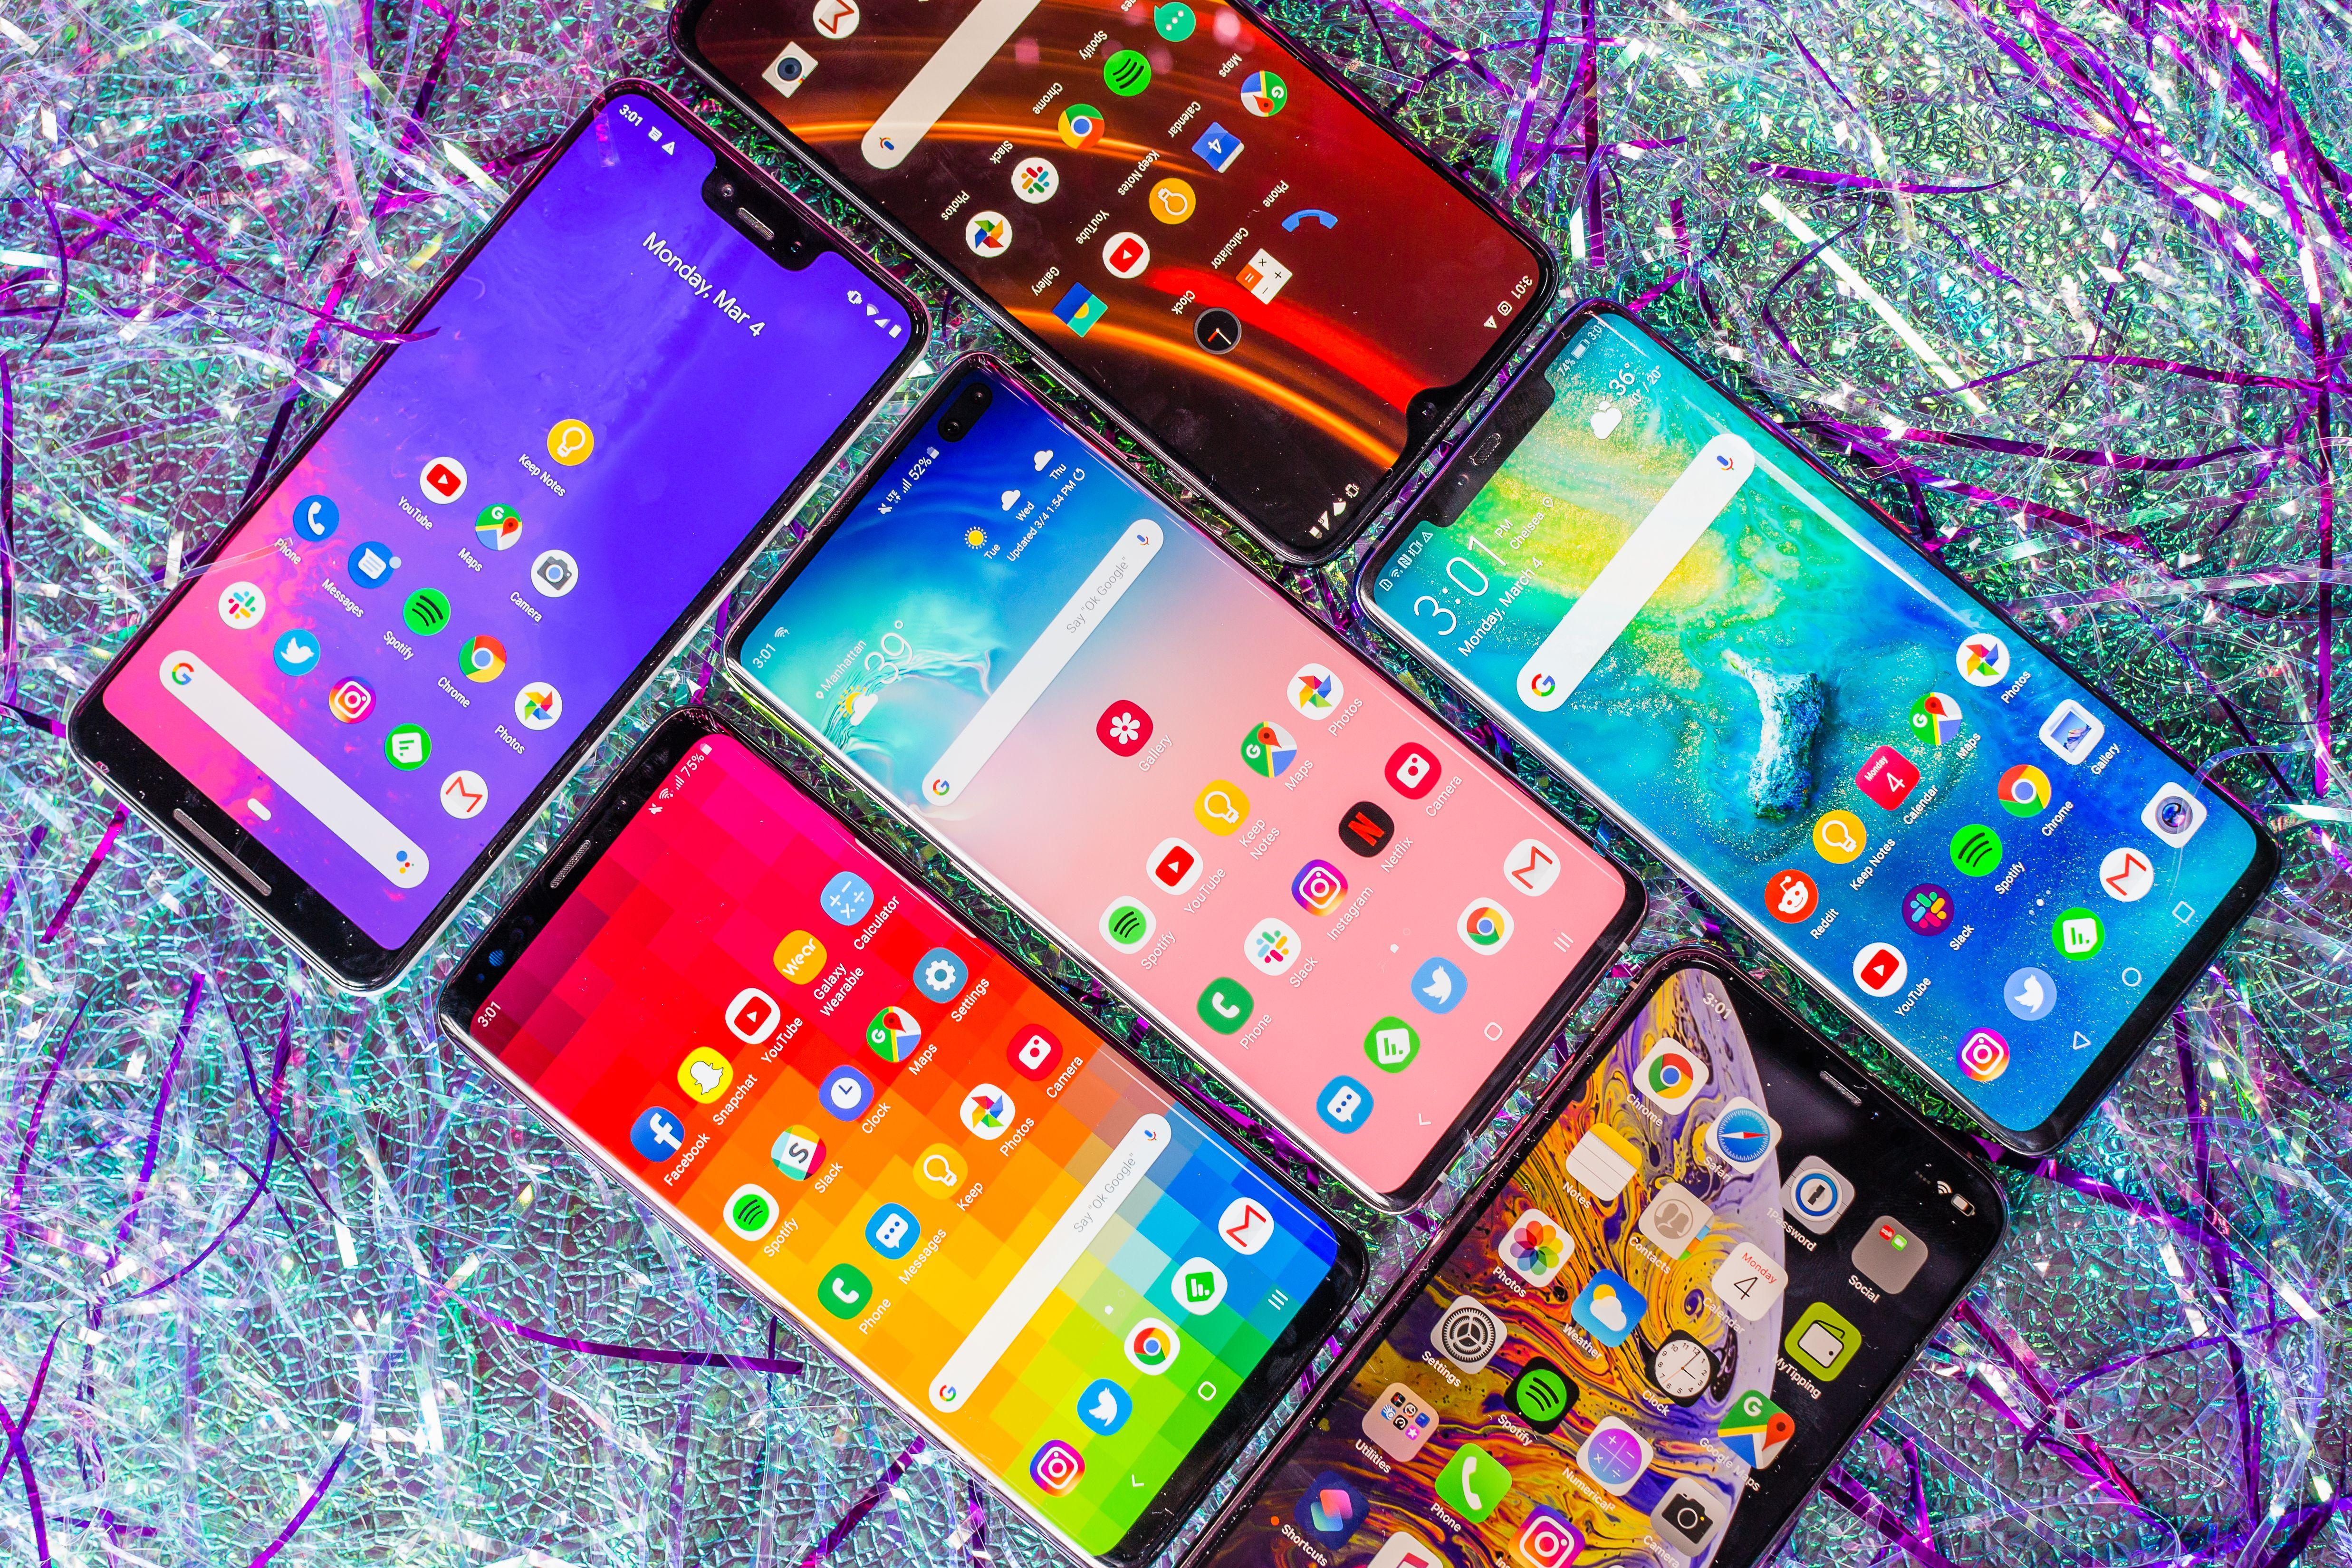 Best Cyber Monday Phone Deals Iphone 11 Galaxy S10 Google Pixel 4